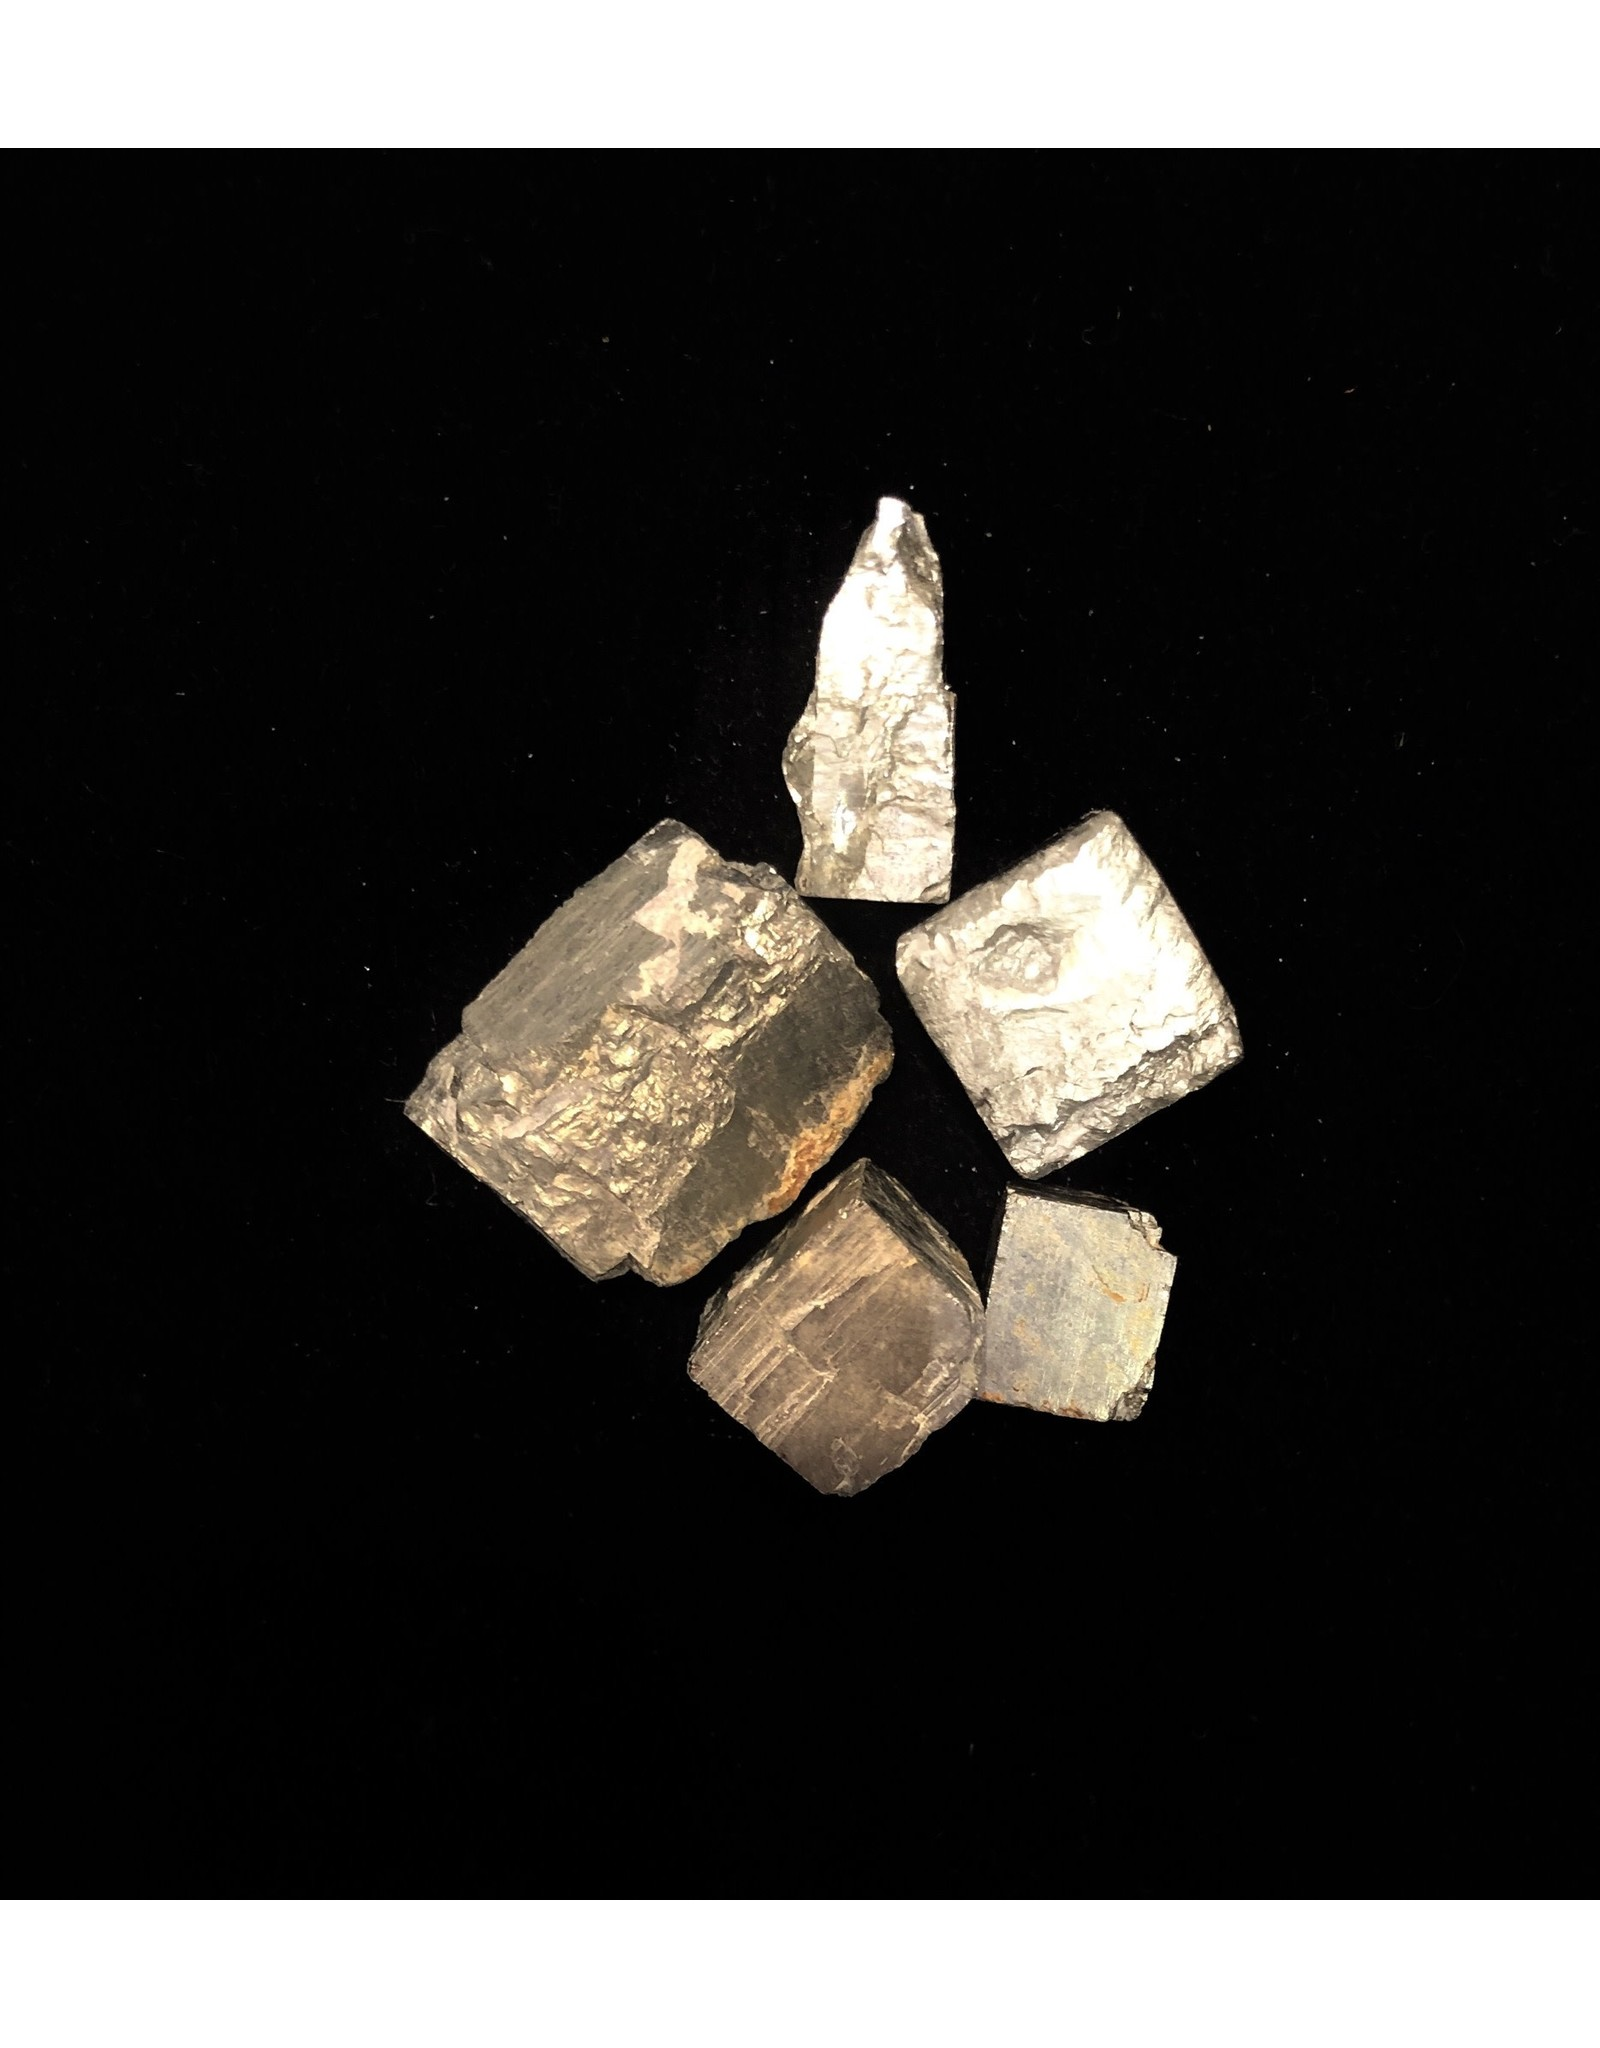 Raw Pyrite Glendon, NC Small